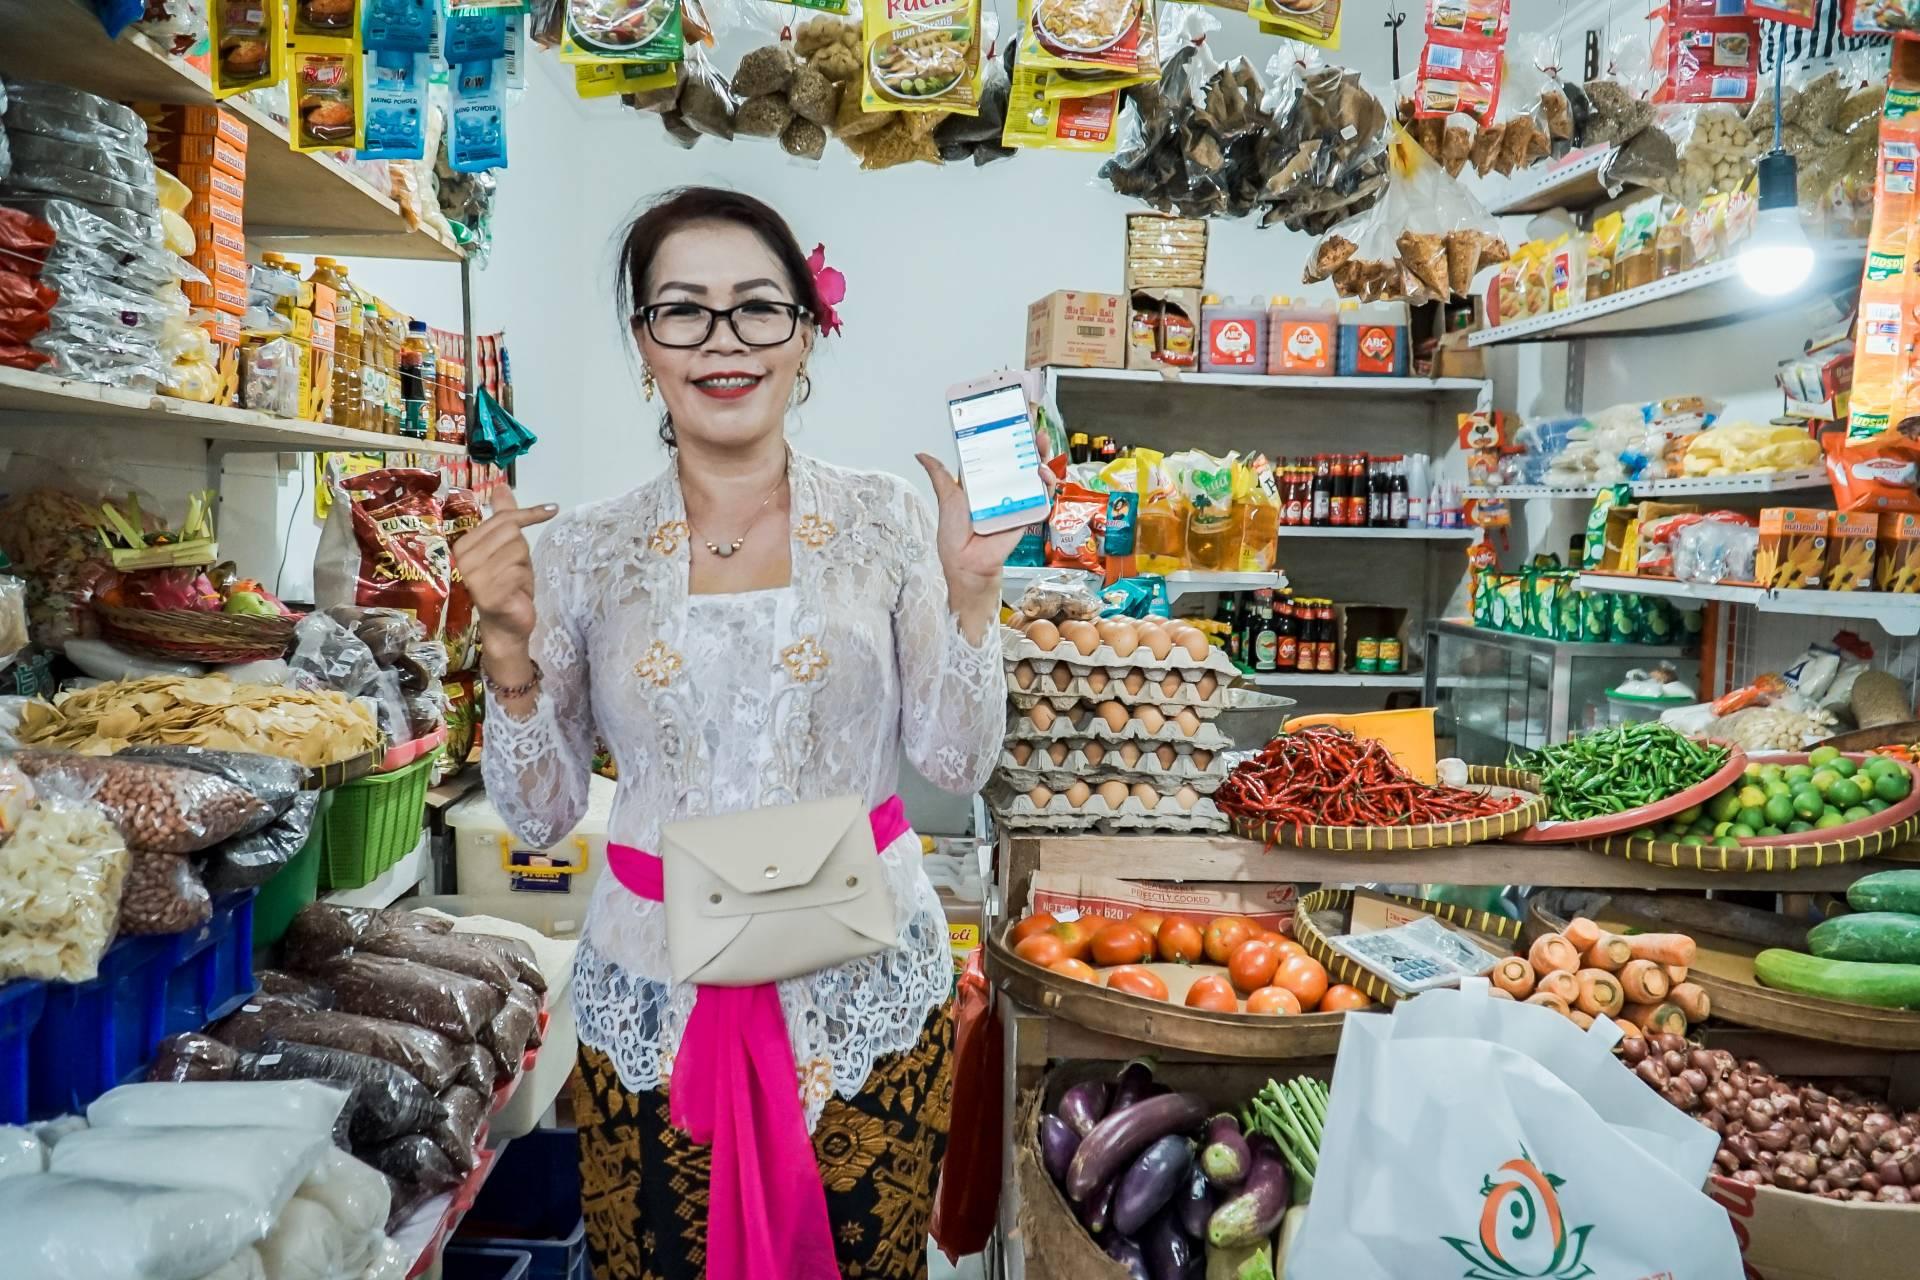 Adoption of QRIS at Phula Kerti Market (Source: Bank Indonesia Bali)